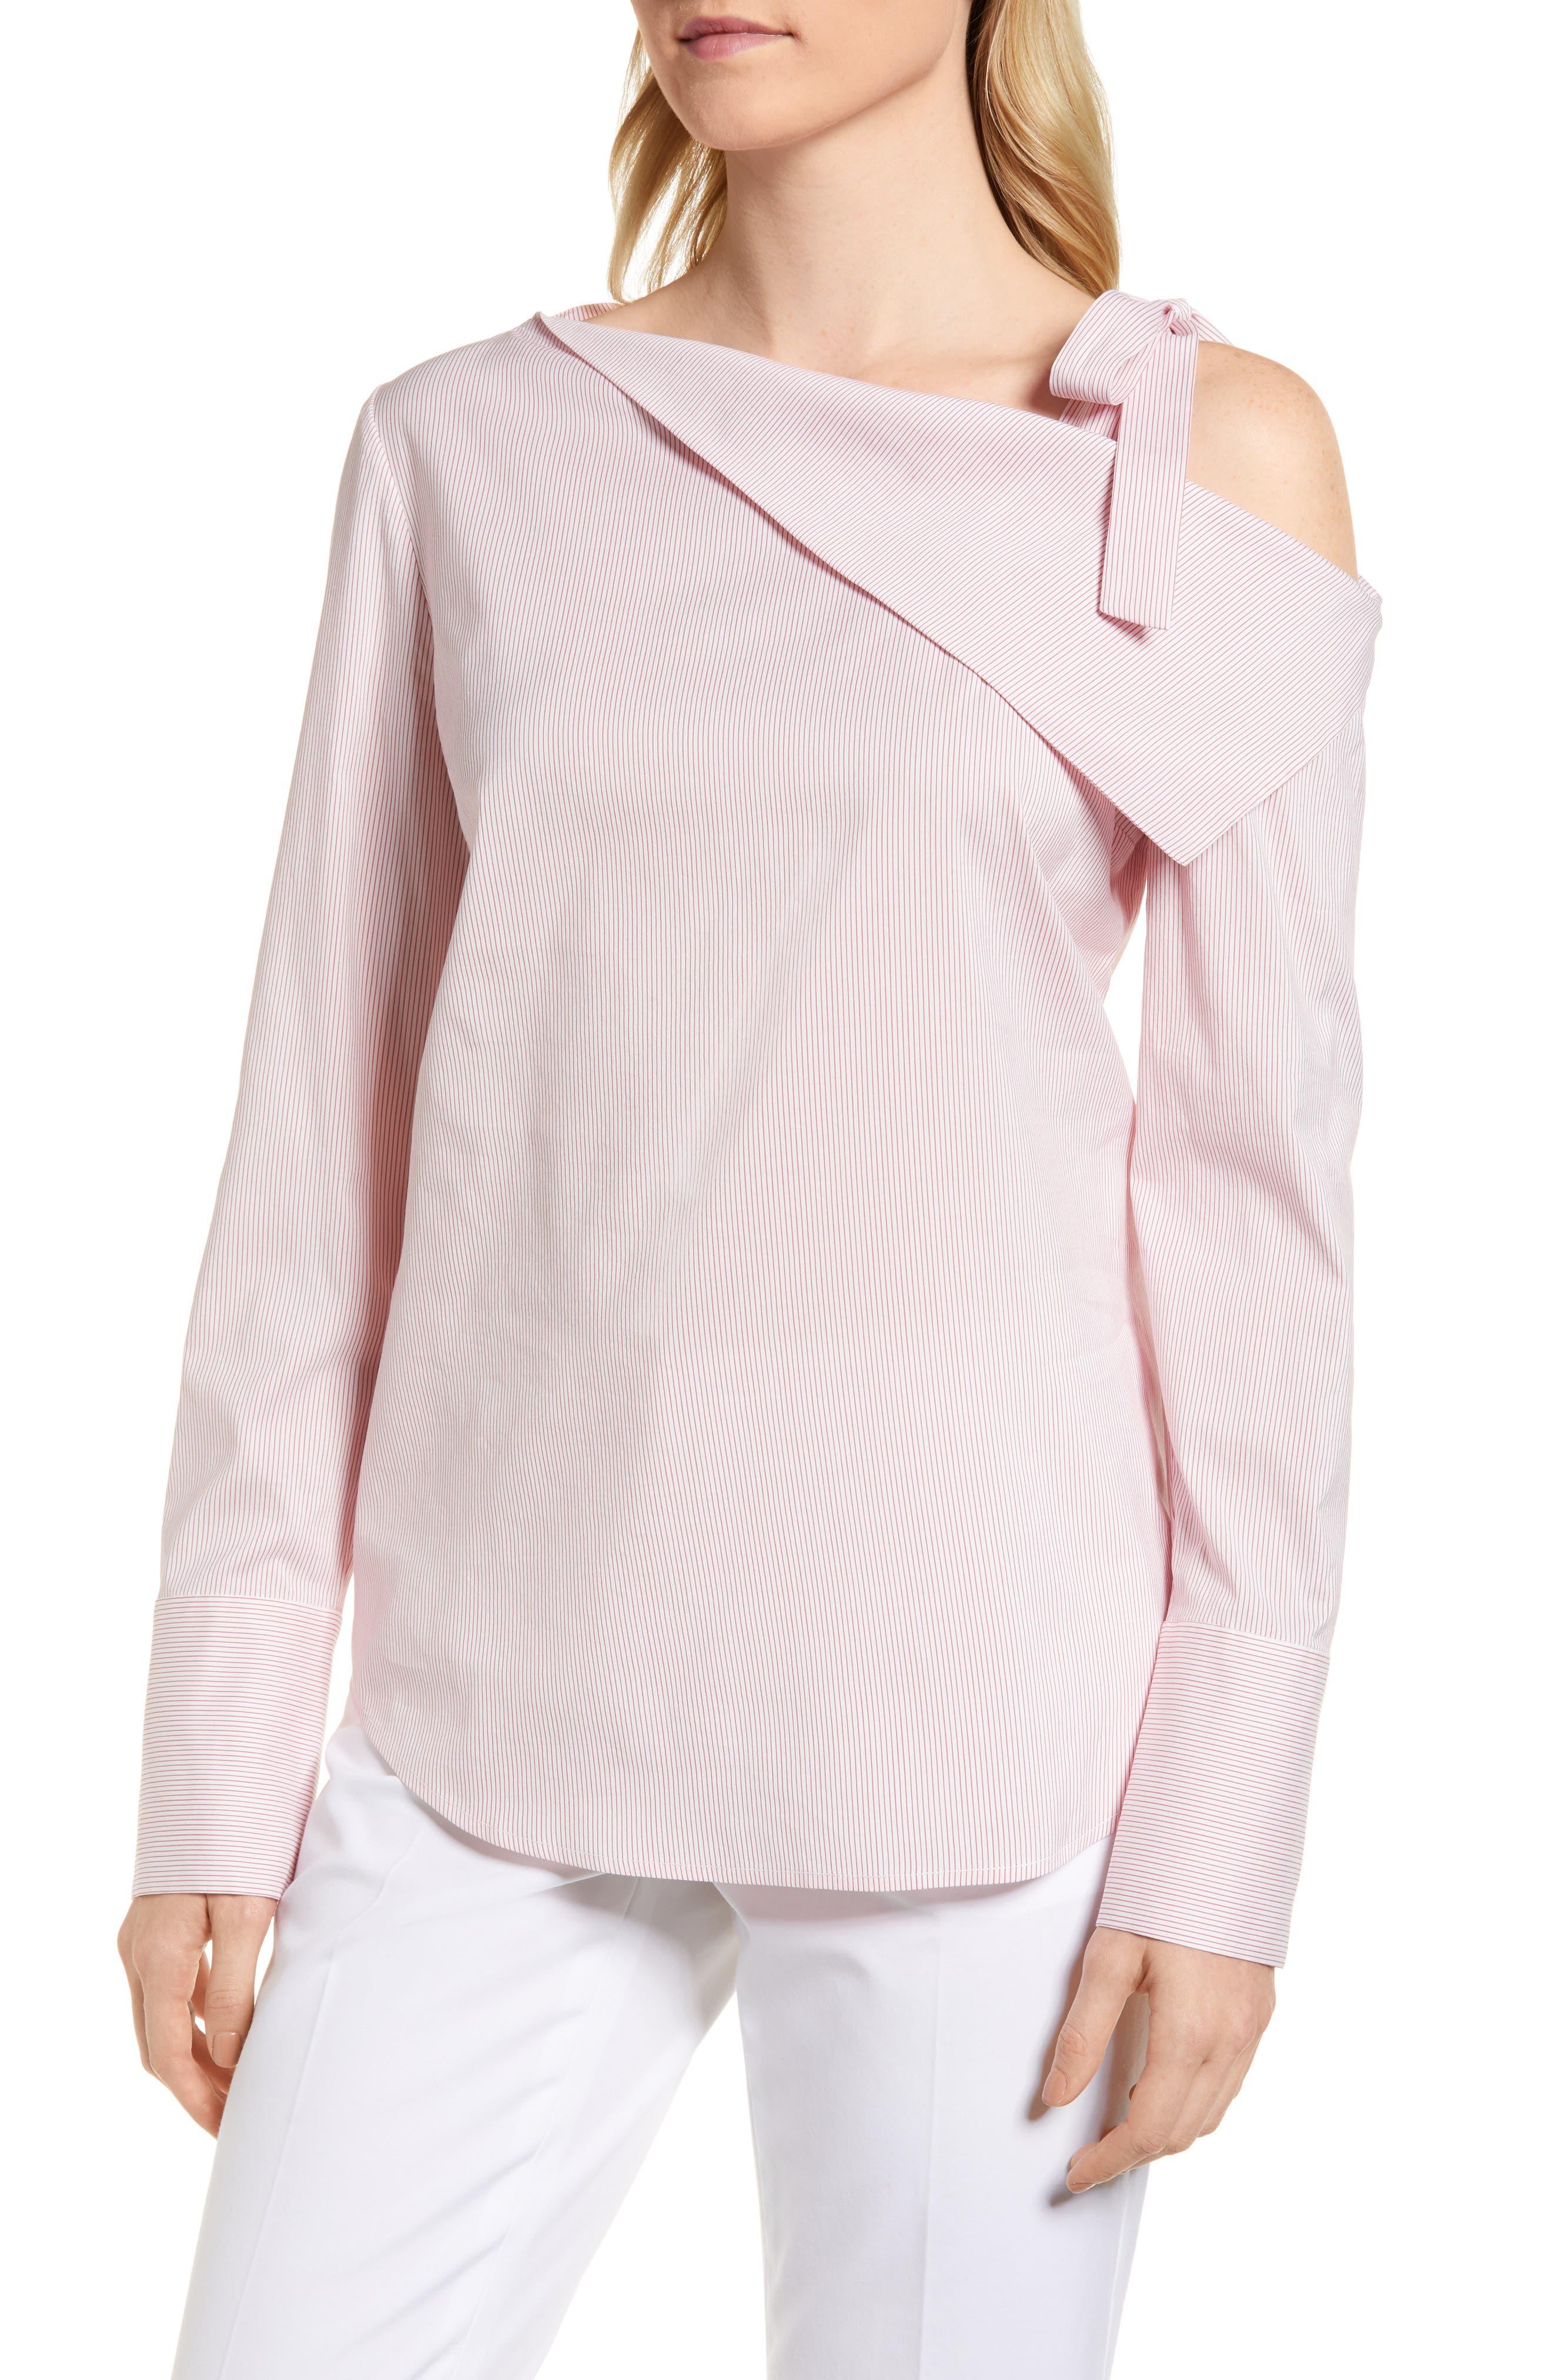 One-Shoulder Shirt,                             Main thumbnail 1, color,                             Pink Honey Chic Stripe